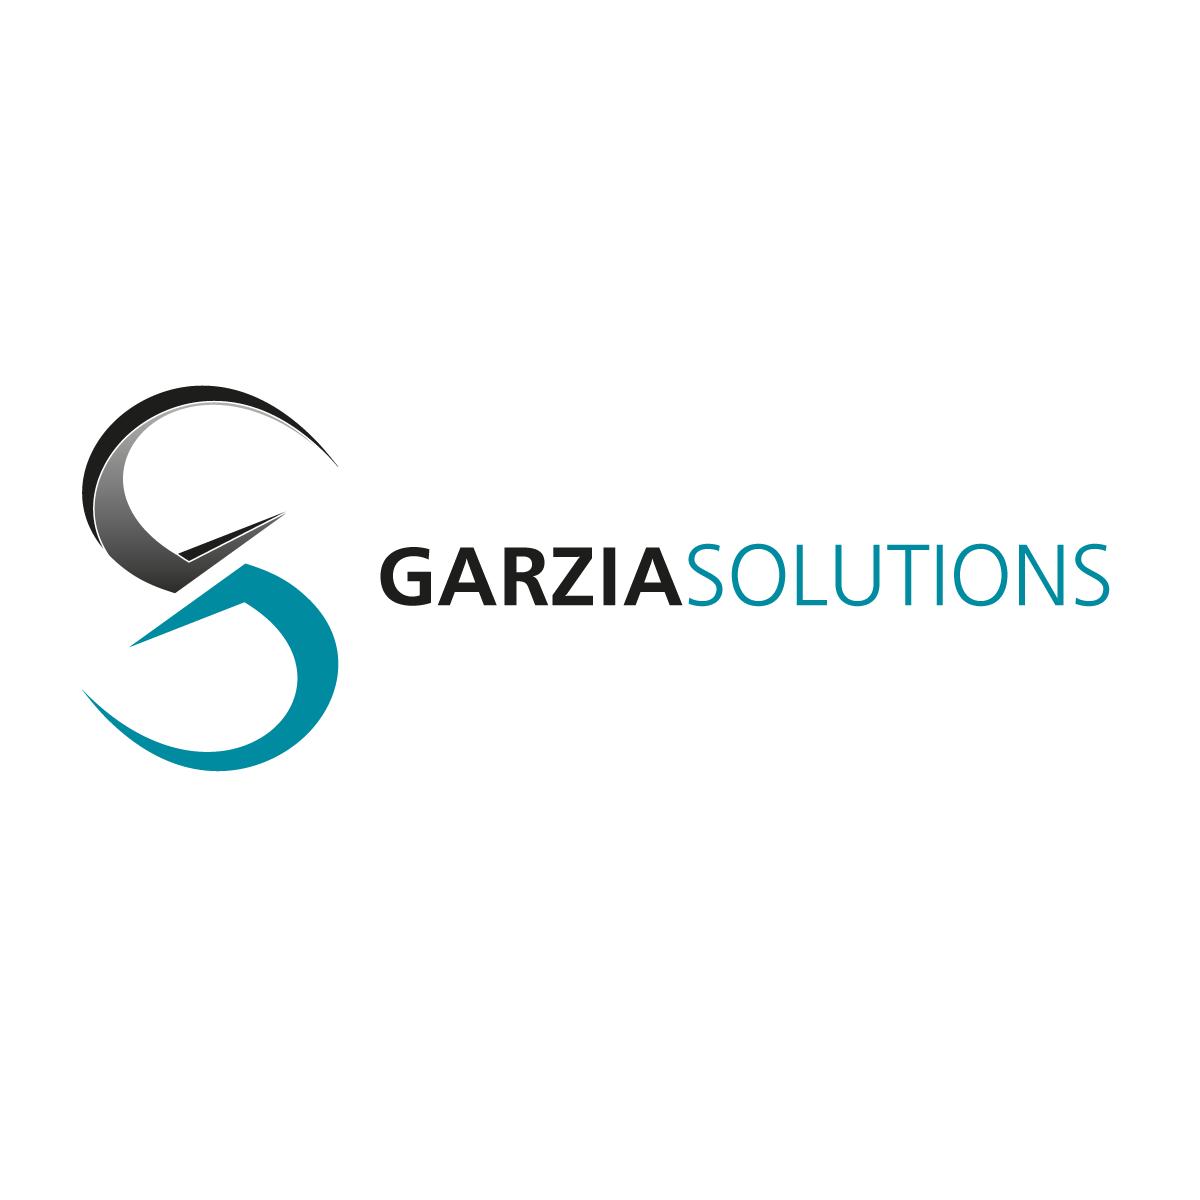 Garzia Solutions, Logo